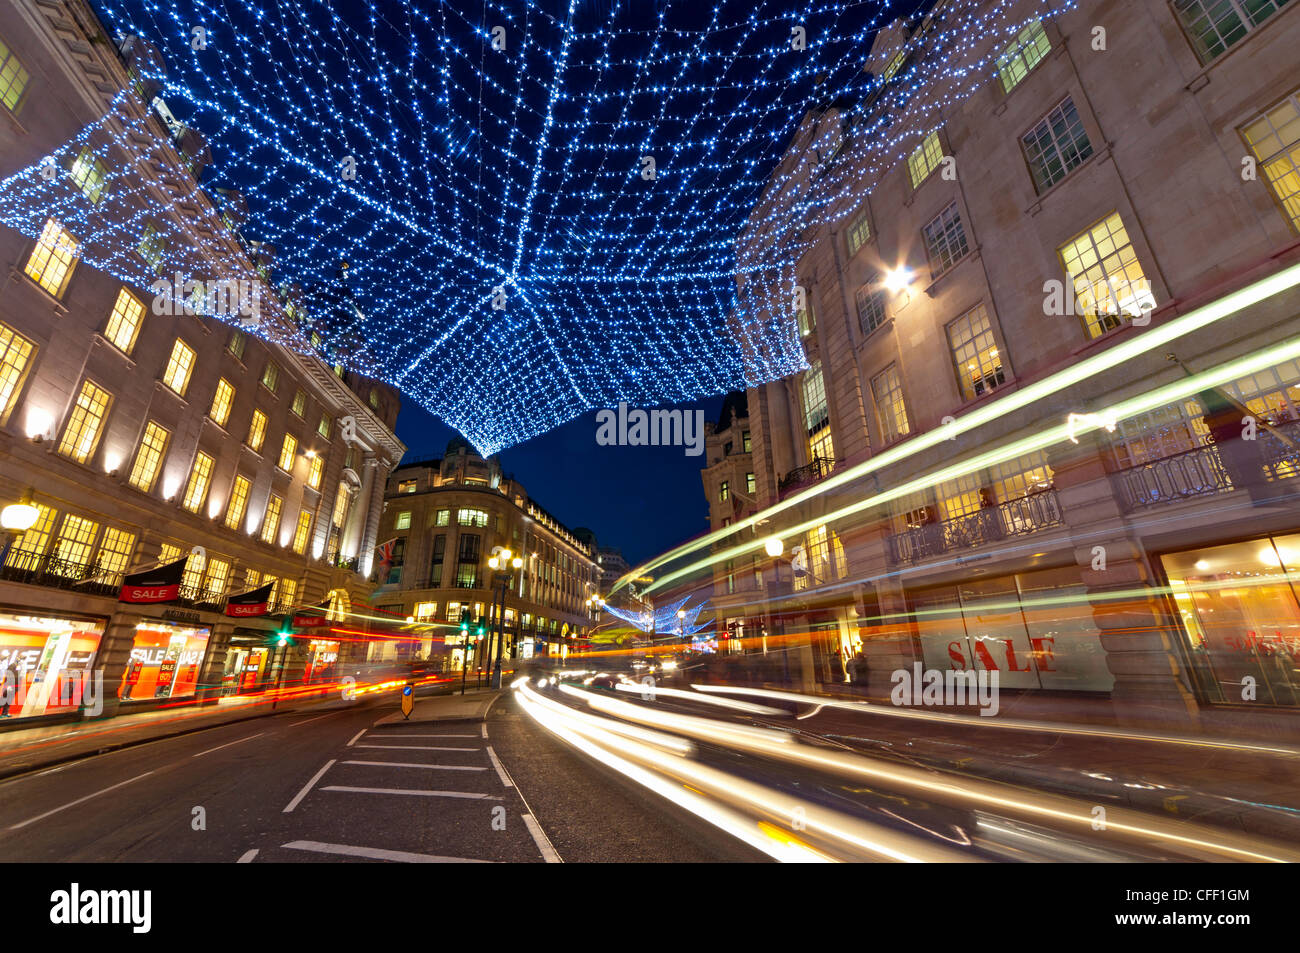 Christmas lights, Regents Street, London, England, United Kingdom, Europe Stock Photo